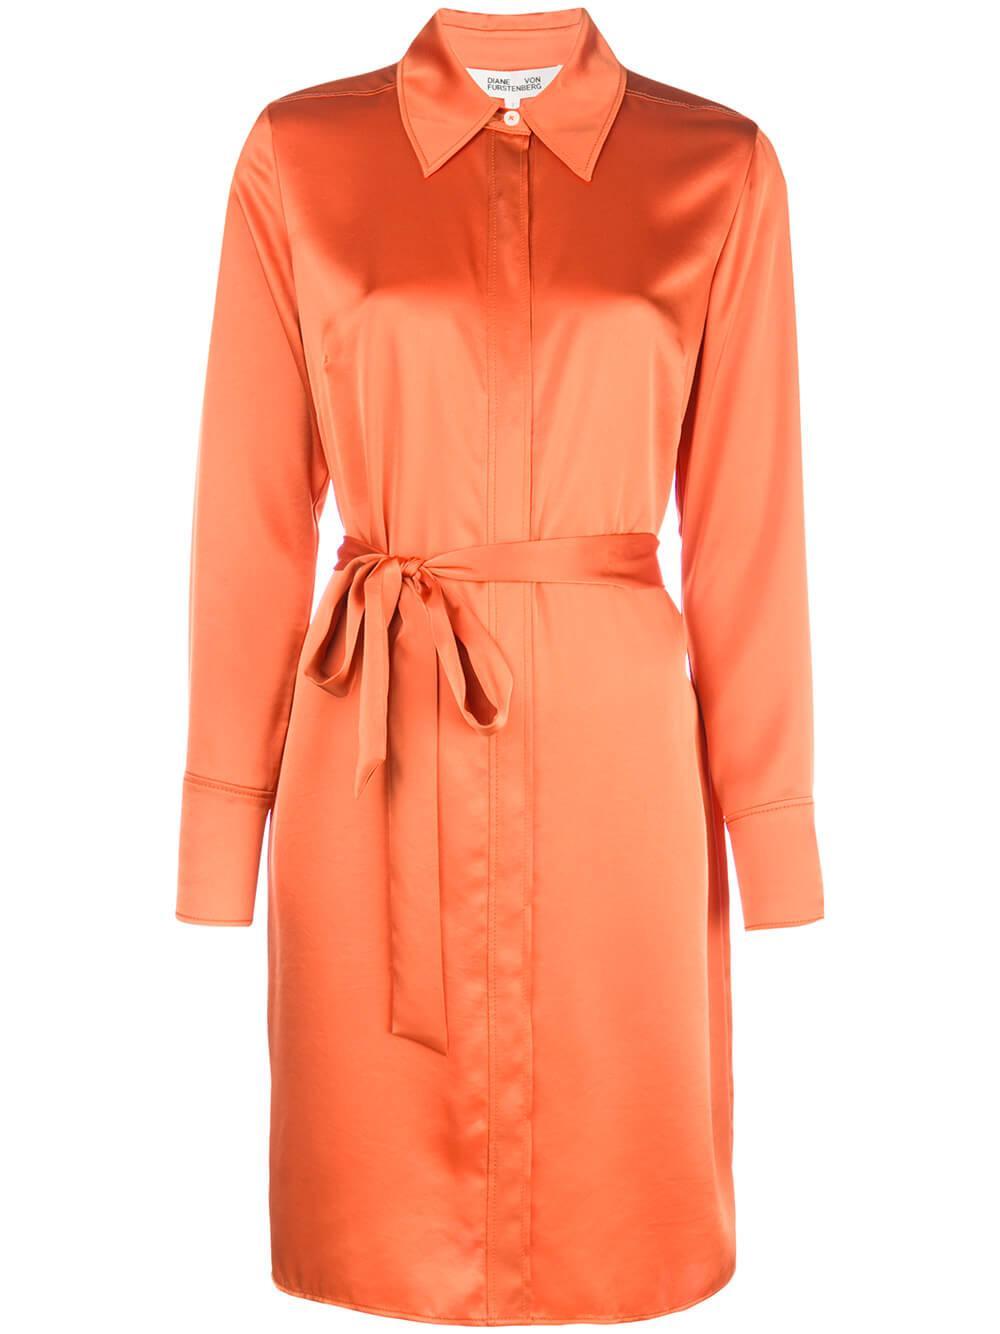 Zello Long Sleeve Belted Shift Dress Item # 13625DVF